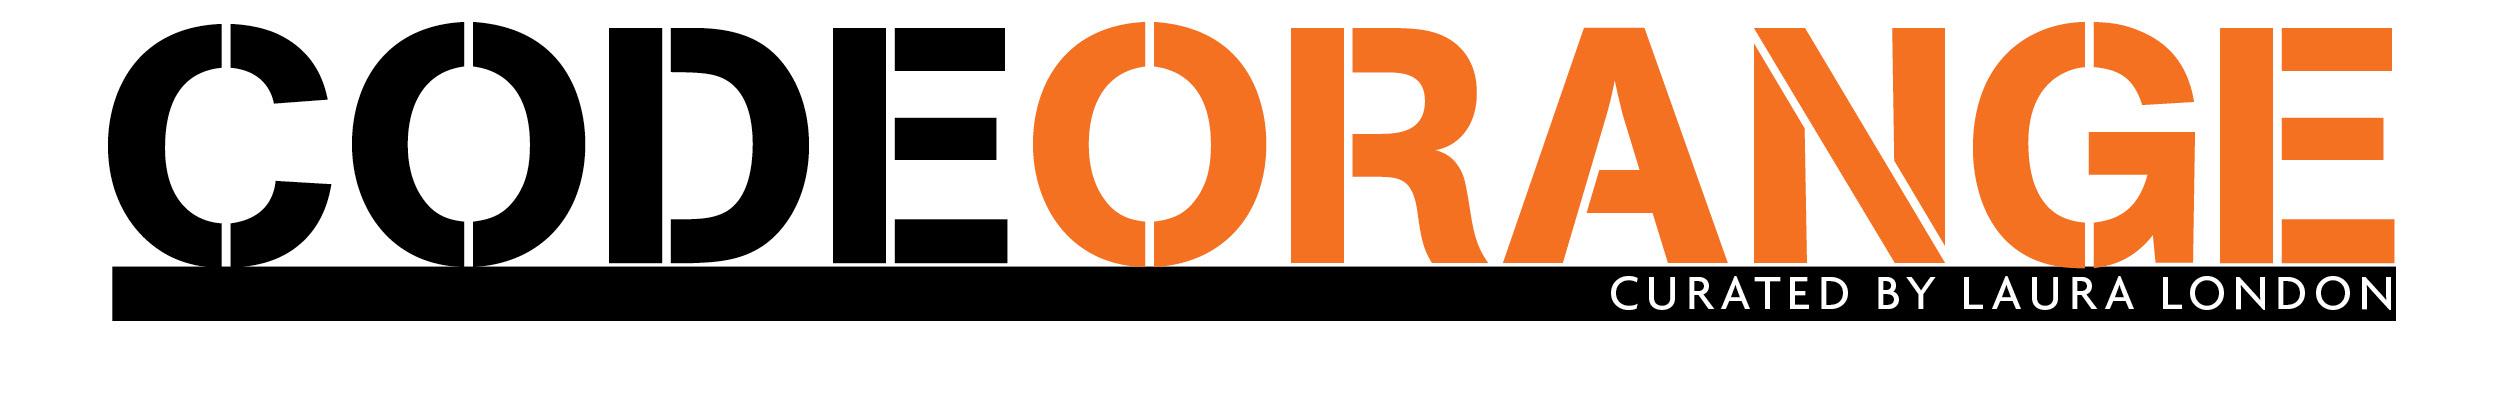 code orange logo <ns>Code Orange</ns>